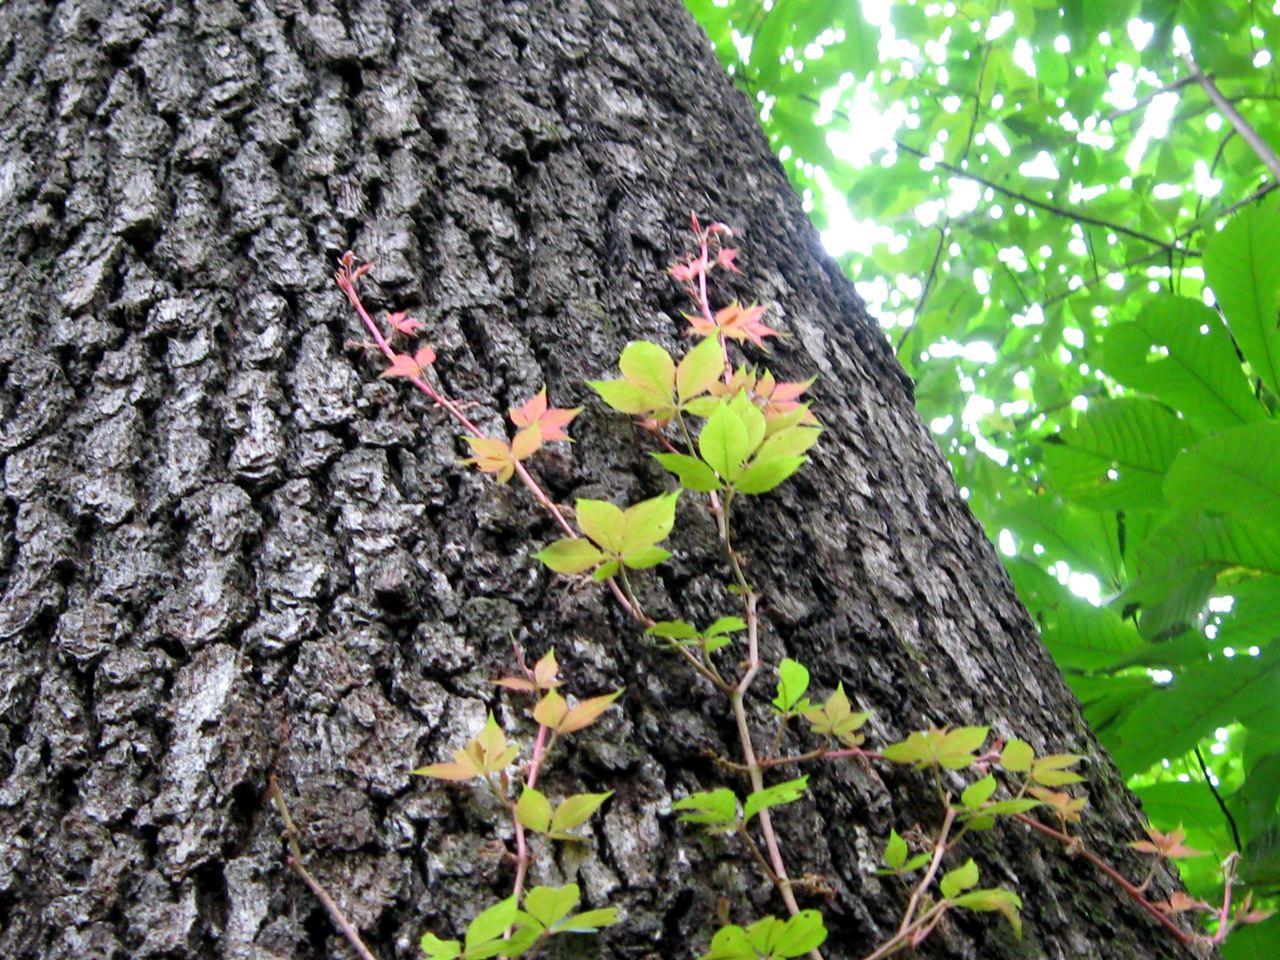 """   virginia creeper tickling a cherrybark oak   "" by    naomivantol    is licensed under    CC BY 2.0"